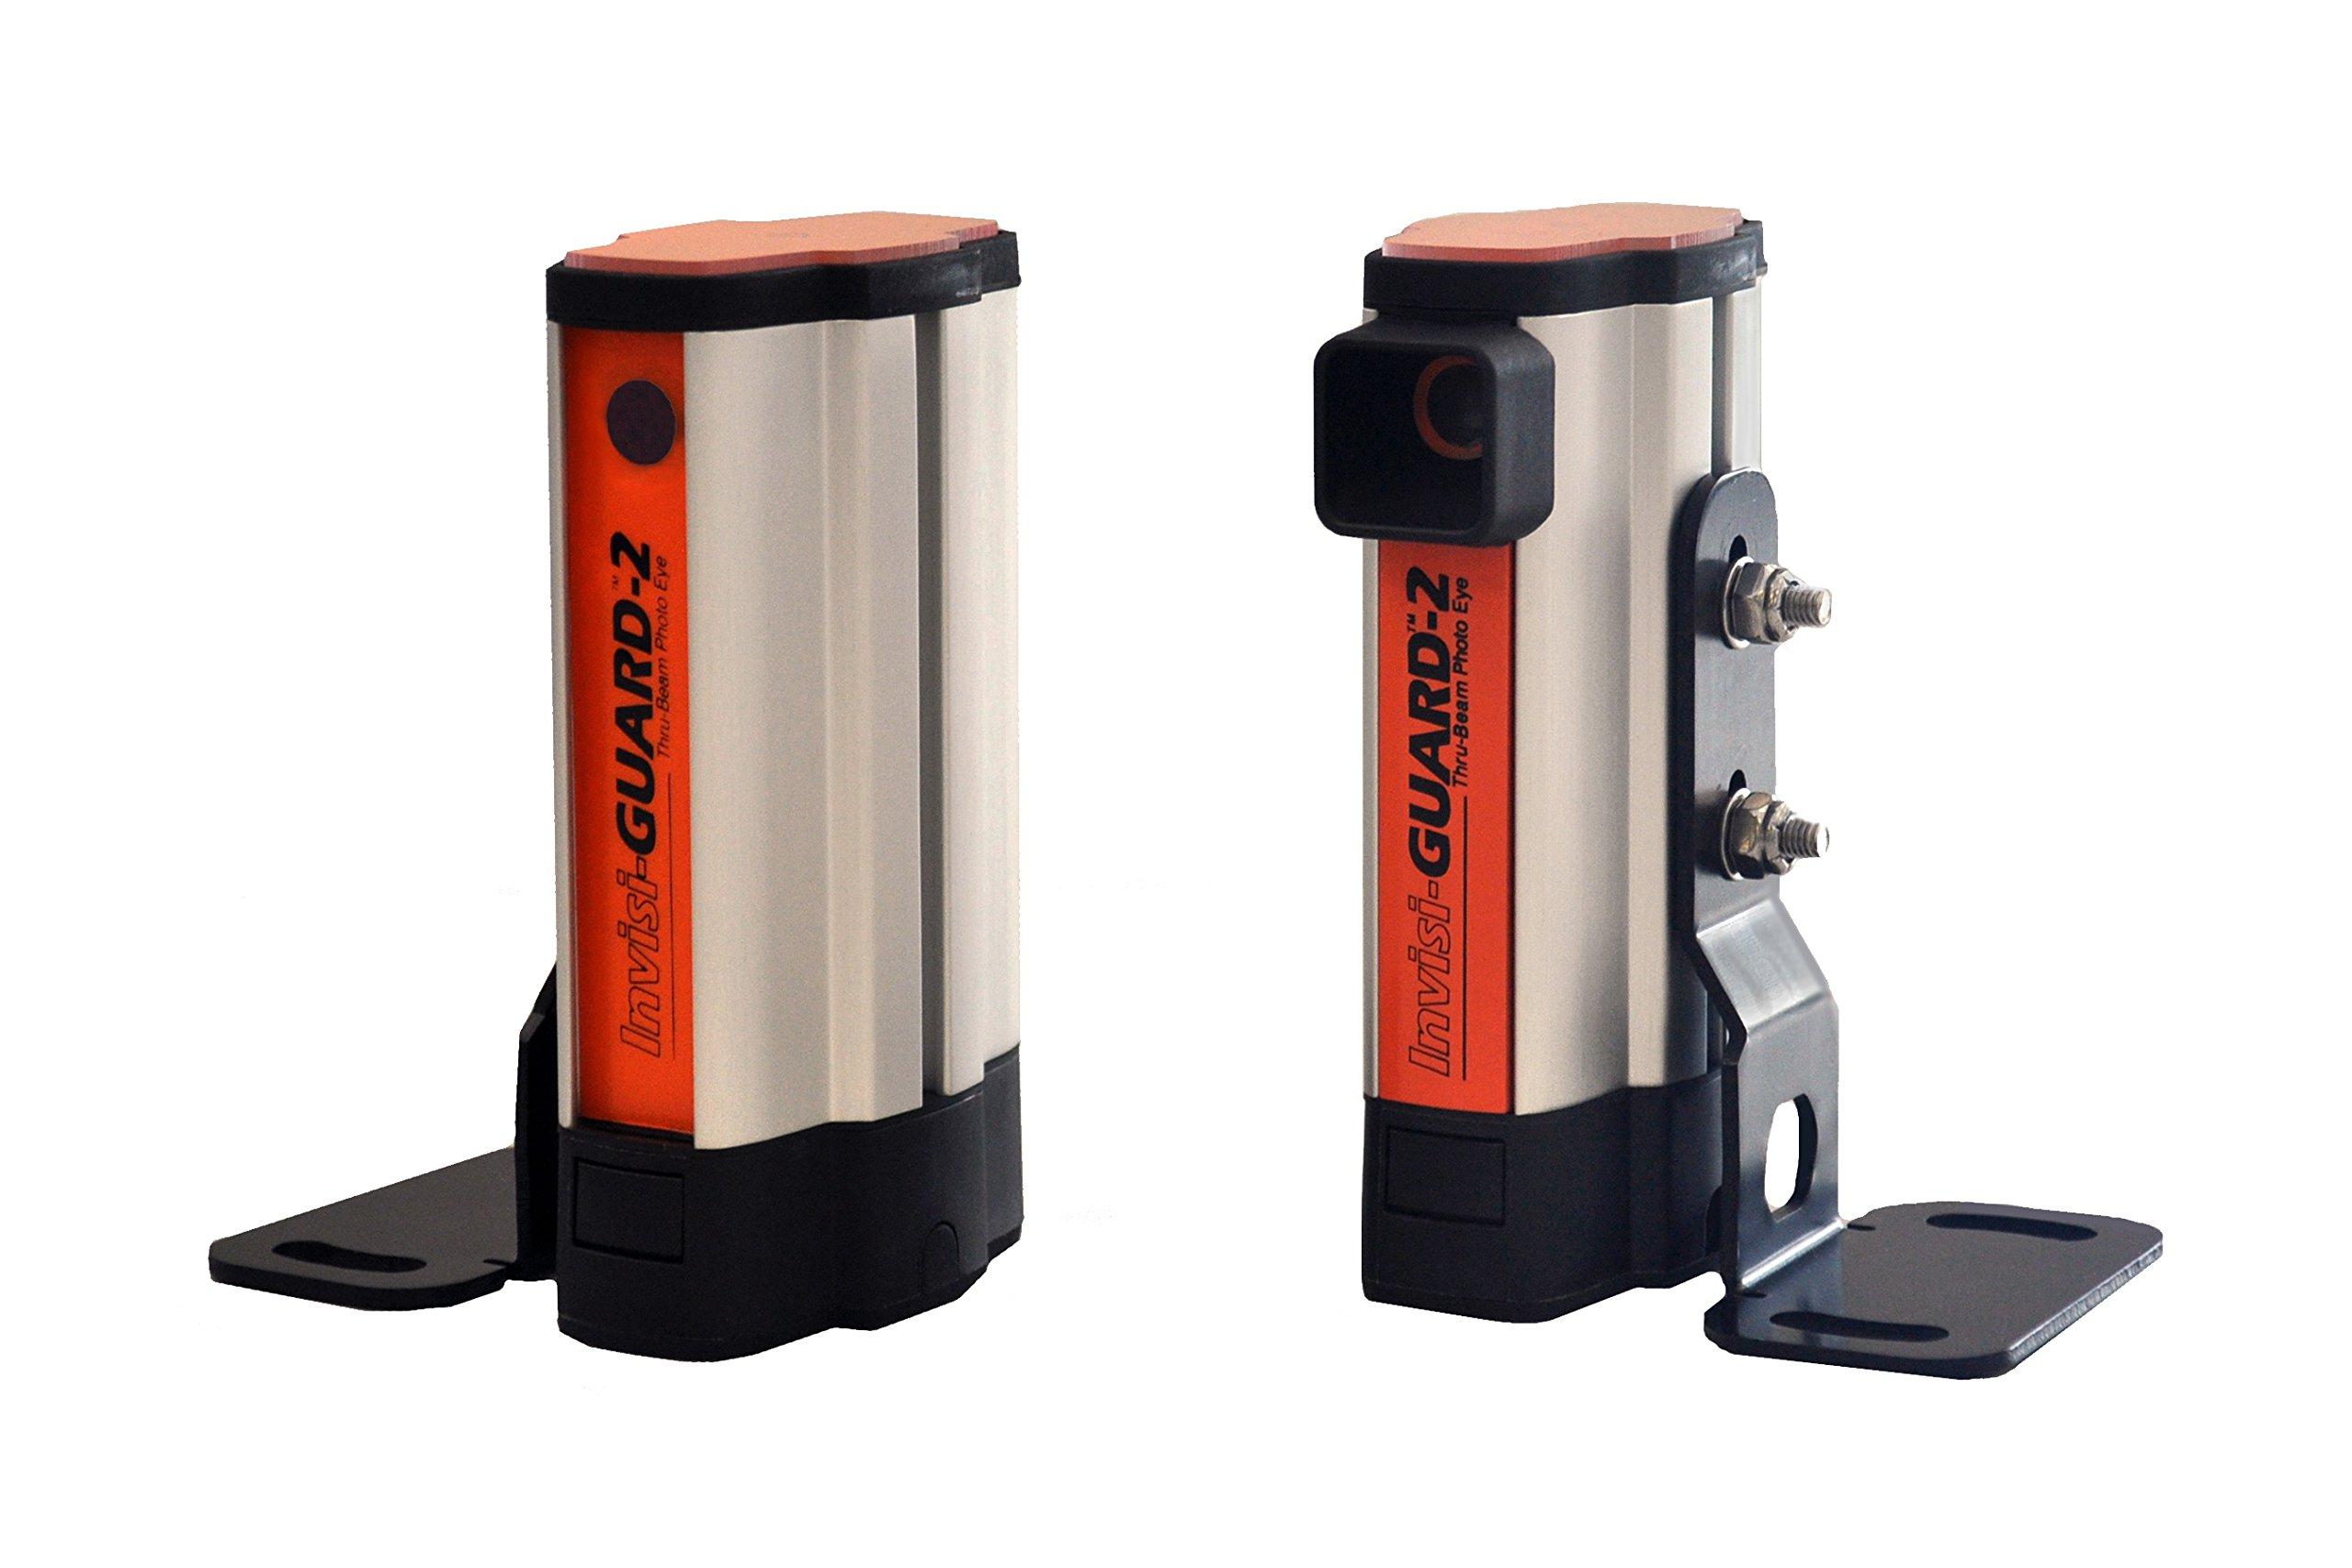 Miller Edge IG2-K10 Invisi-Guard-2 Thru Beam Photo Optic System with Battery Powered Emitting Unit, 30 Feet